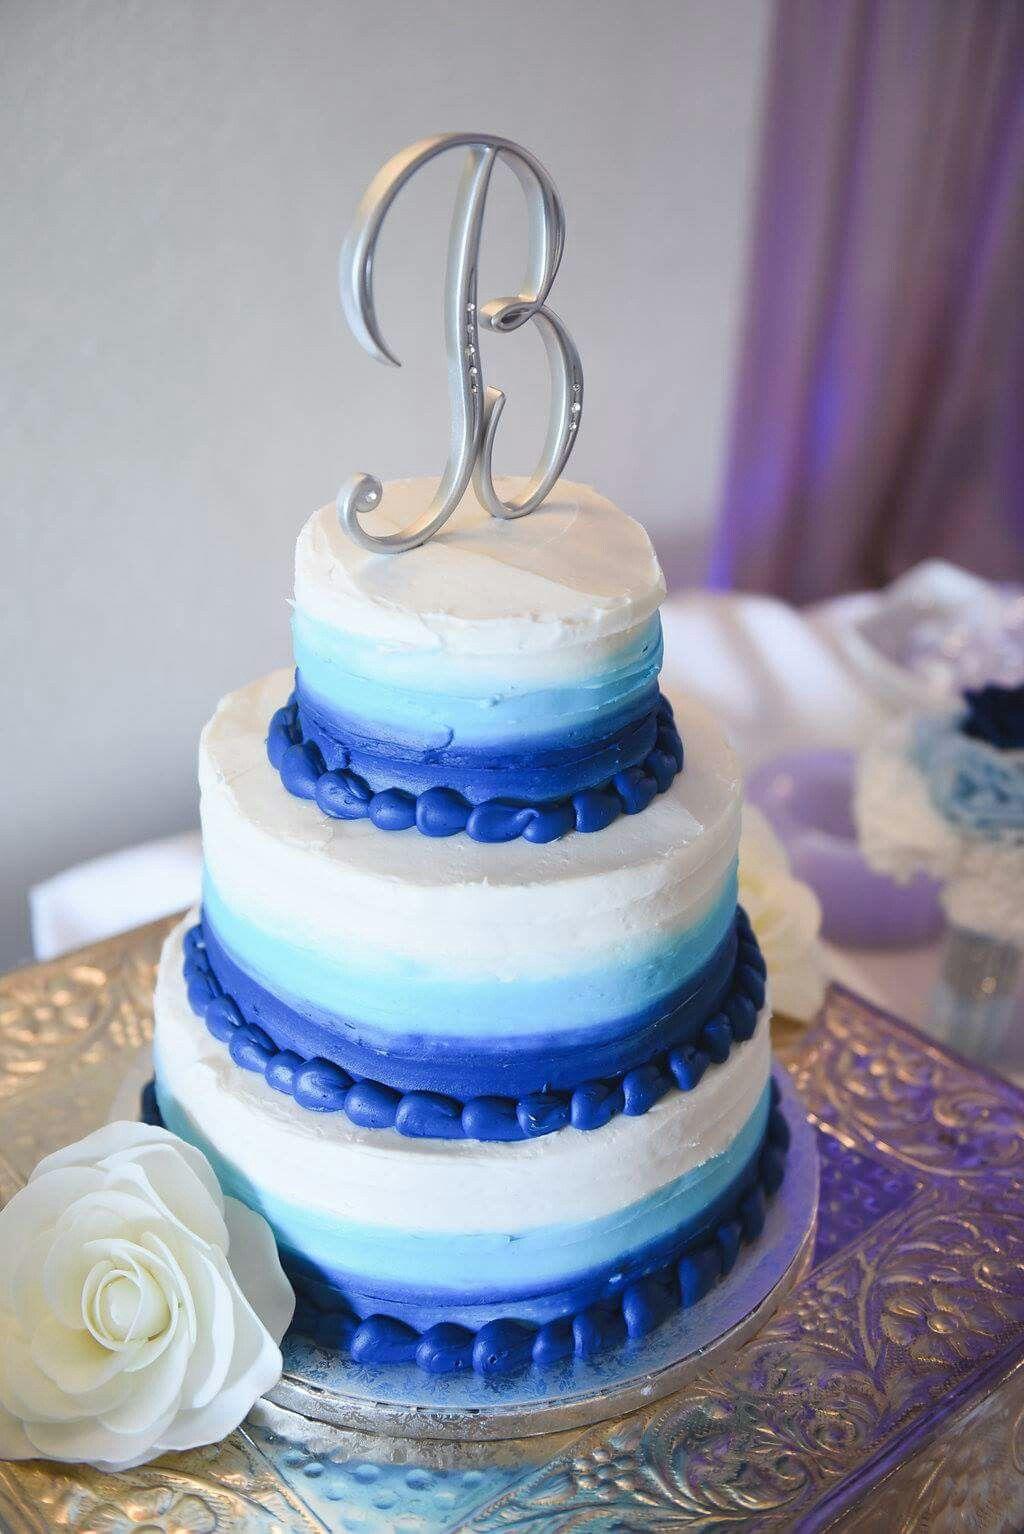 Astonishing Blue Ombre 3 Tier Wedding Cake From Sams Club Bakery Sams Club Personalised Birthday Cards Paralily Jamesorg